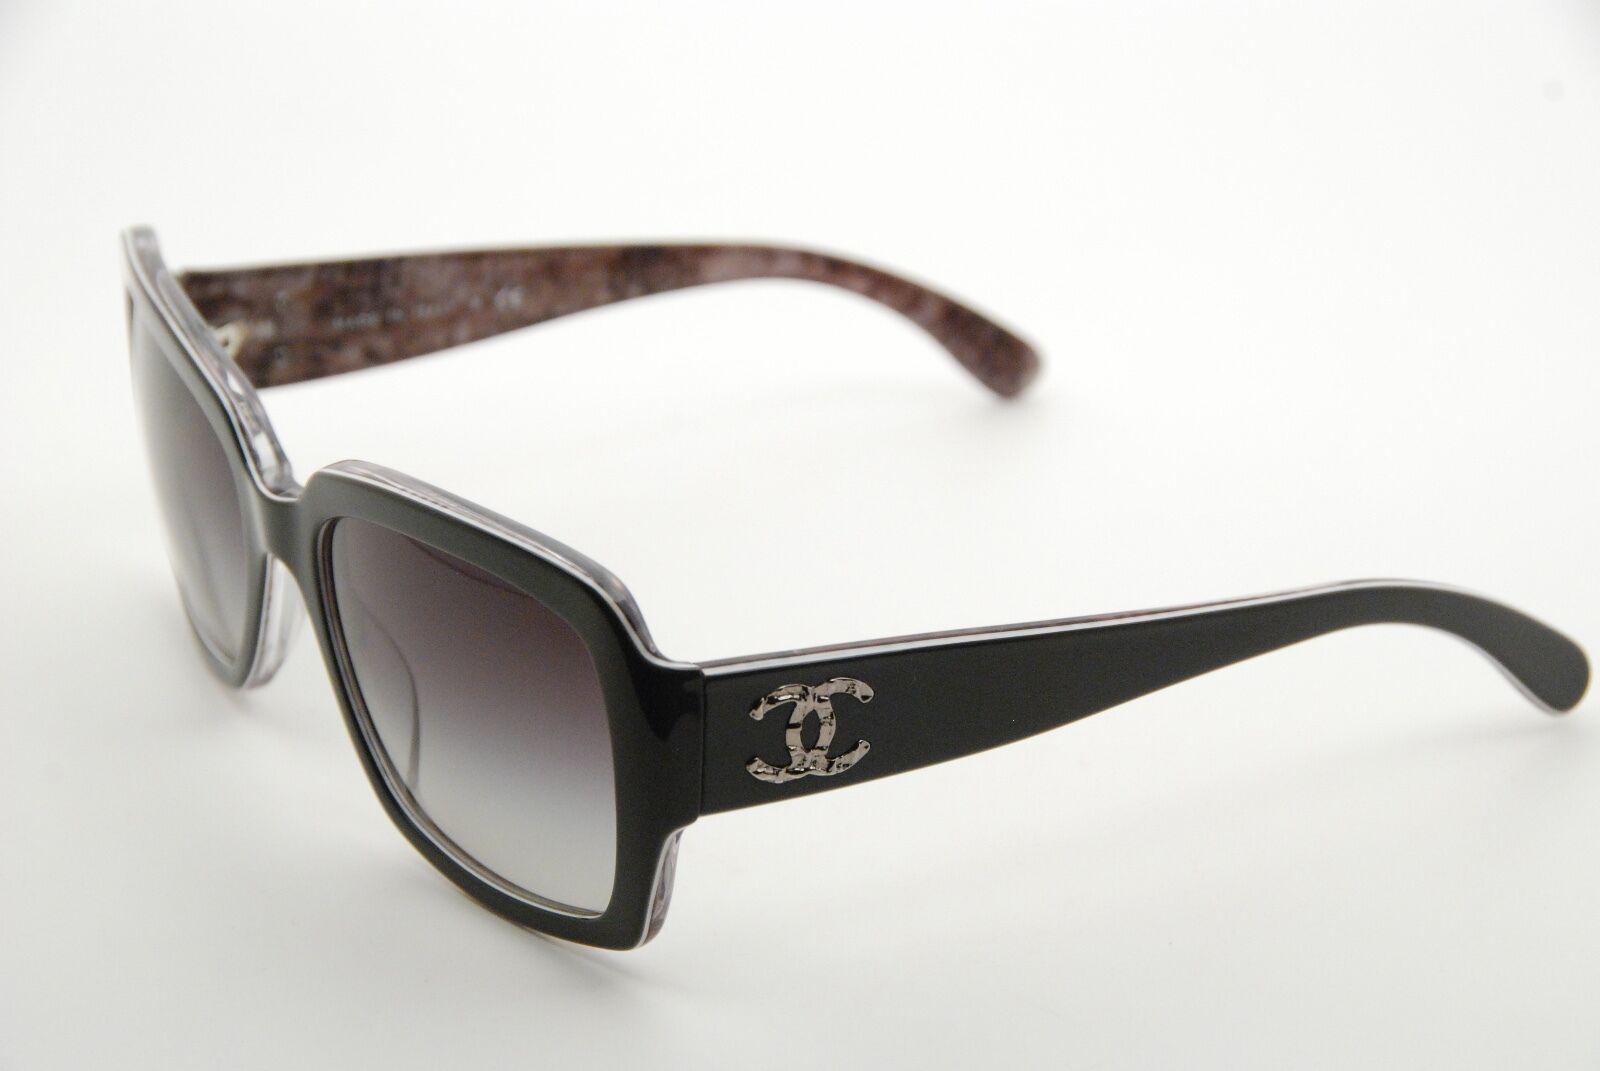 55749f20c9 Authentic CHANEL 5221 C.1311 3c Grey Gradient 56mm 3n Sunglasses ...